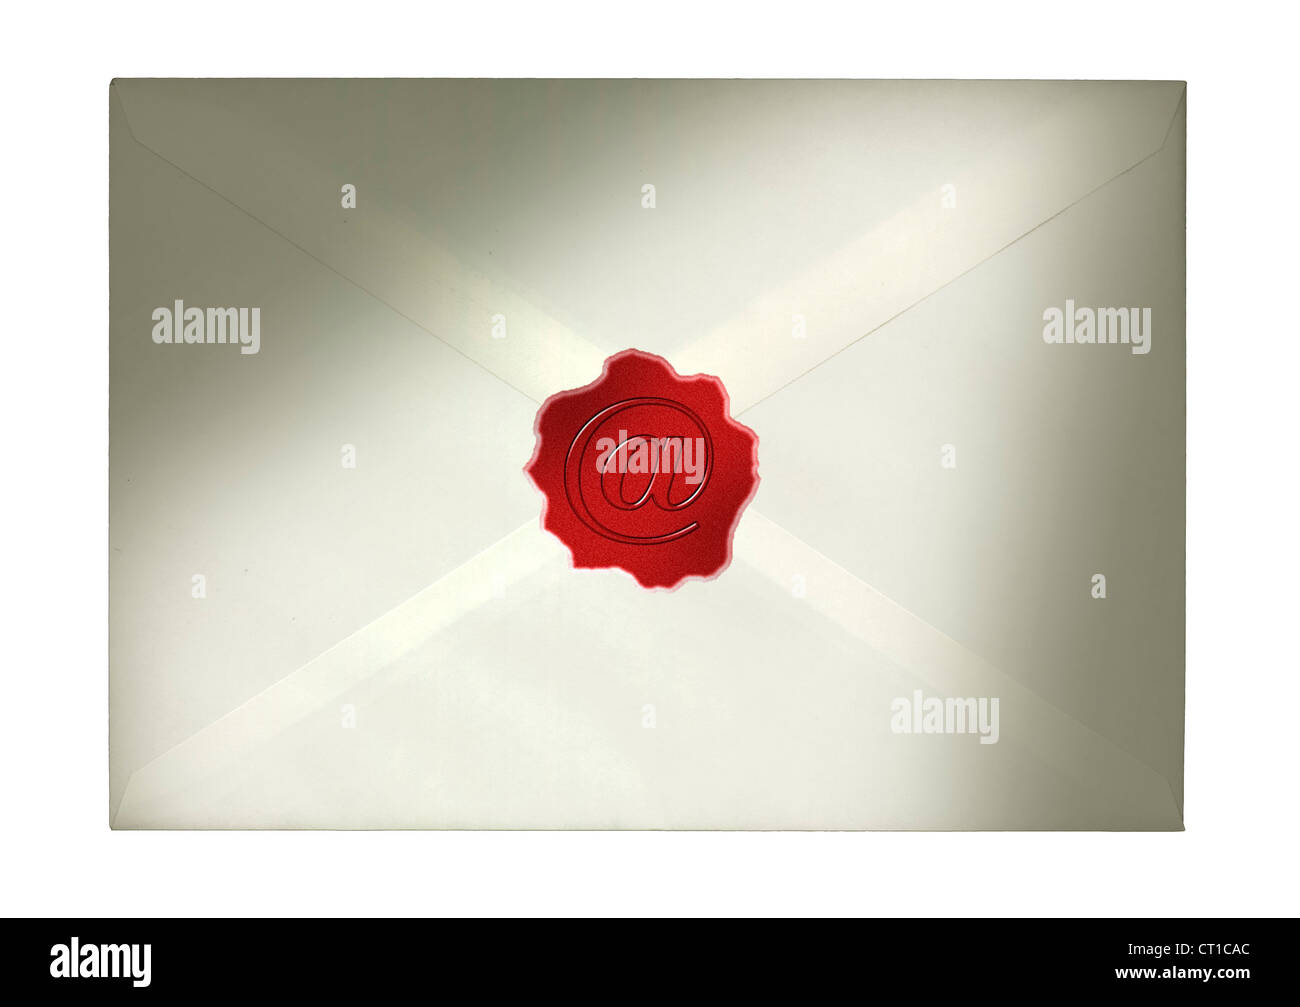 Lettre d'un joint et un signe sur elle - Bref mit und als Zeichen à Siegellack 2005-2009 standard Photo Stock